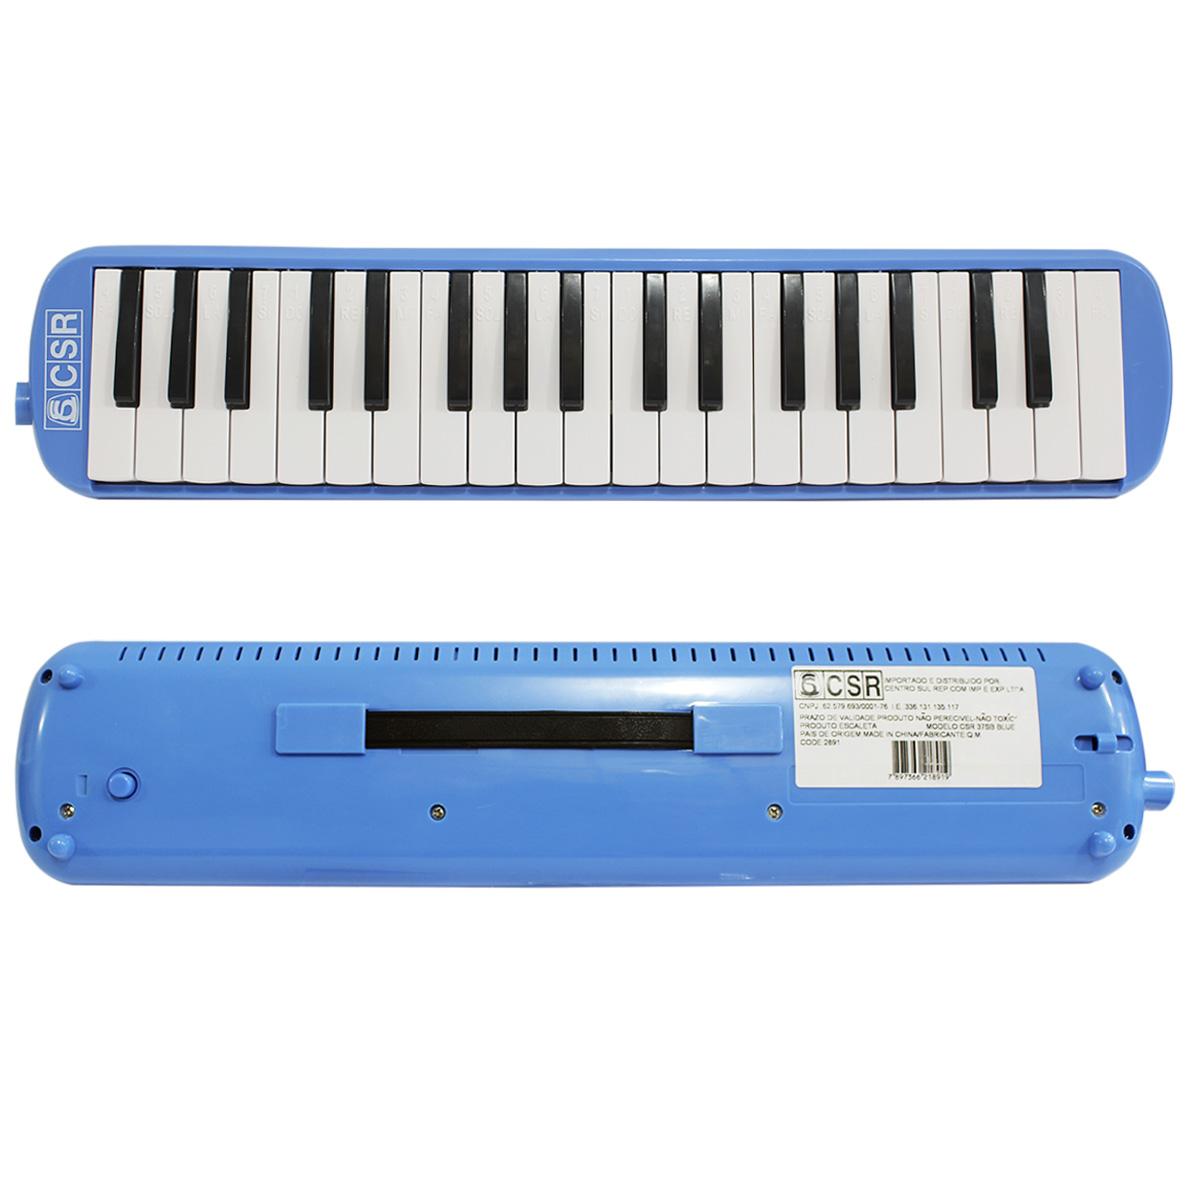 Escaleta Melodica com 37 Teclas Azul CSR - CSR37SB-BLUE